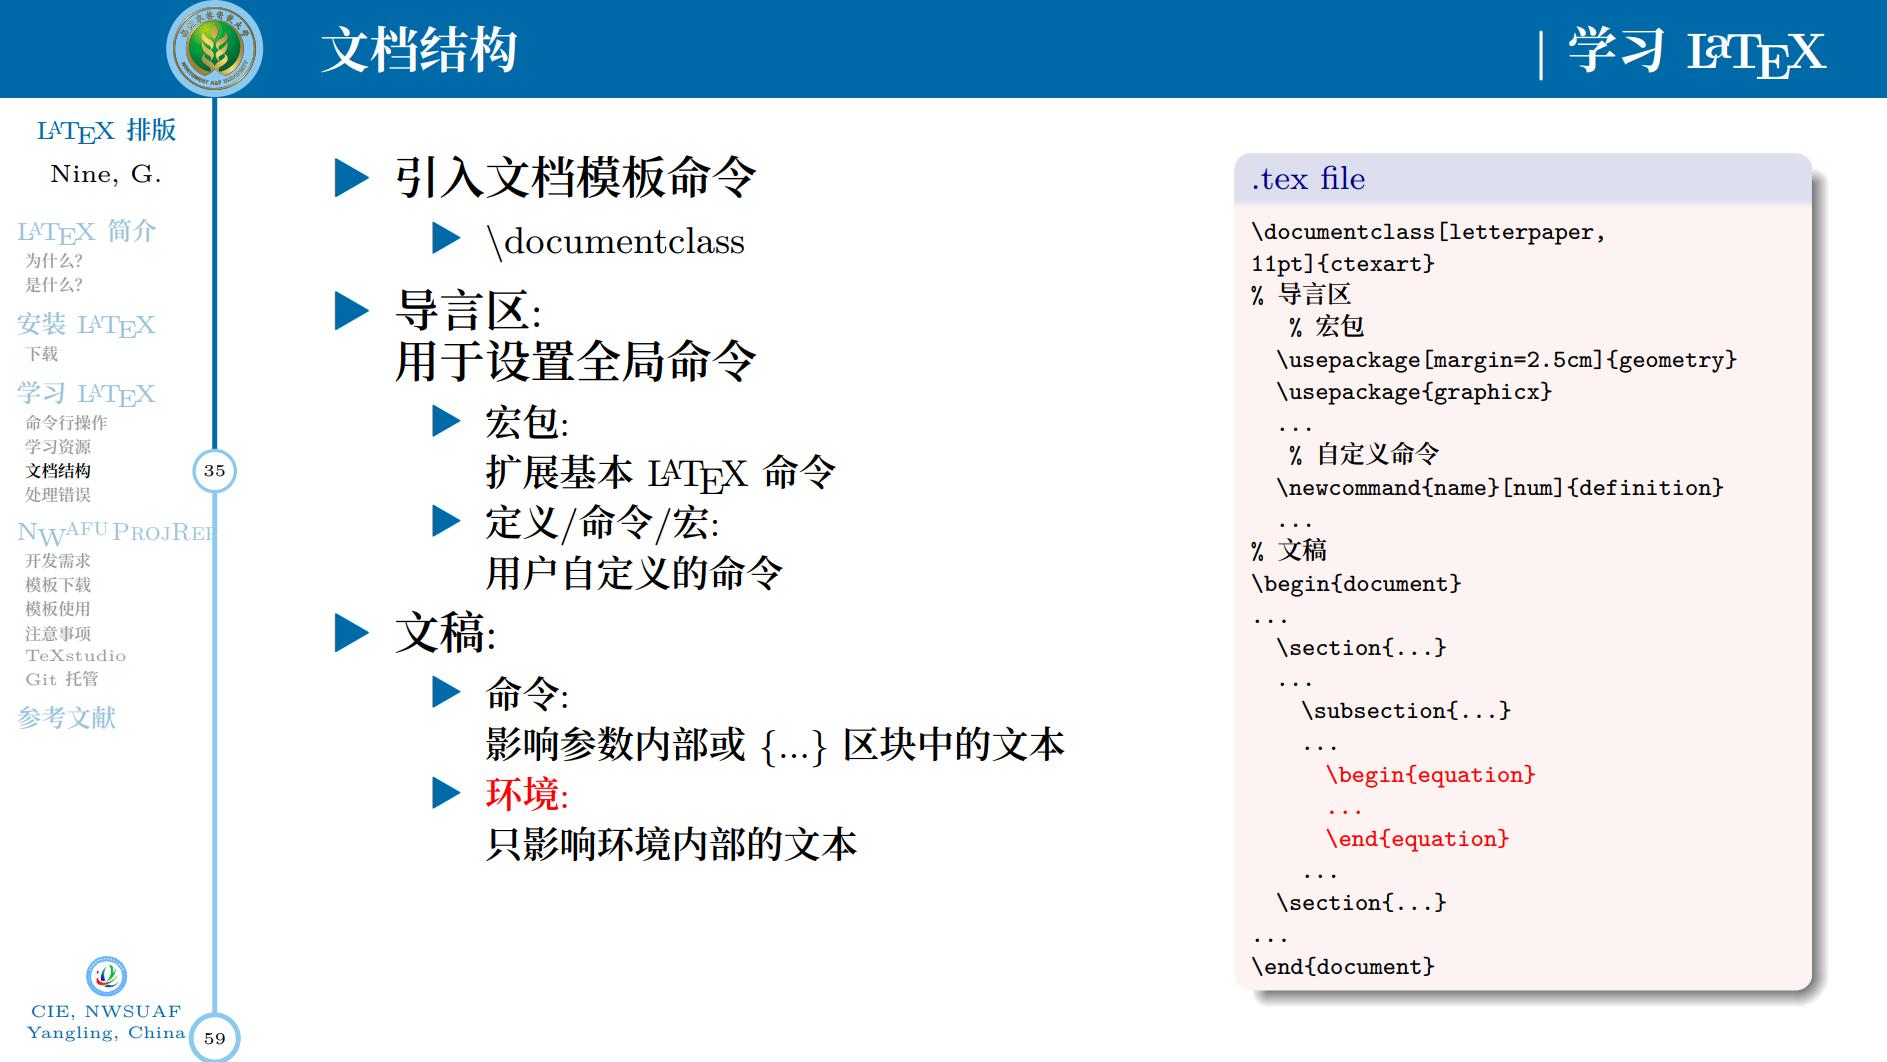 LaTeX排版及nwafuprojrep模板使用简介